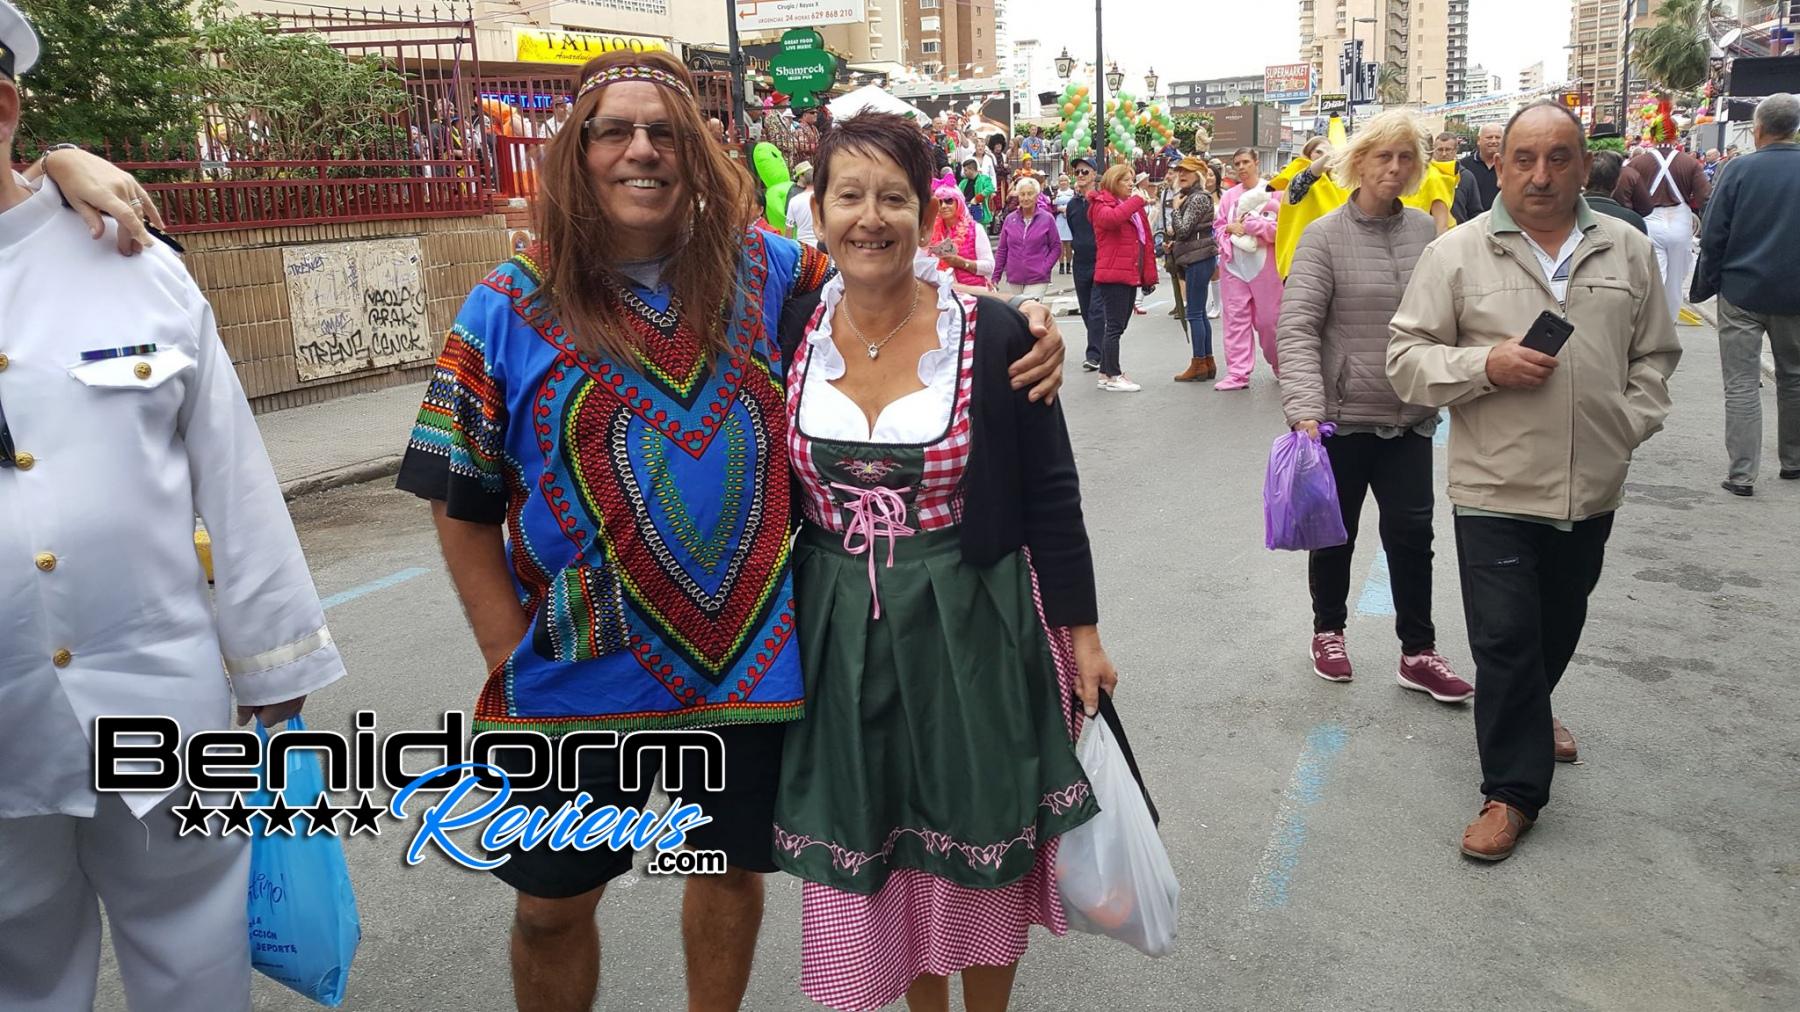 Benidorm-Fiestas-2019-Fancy-Dress-243